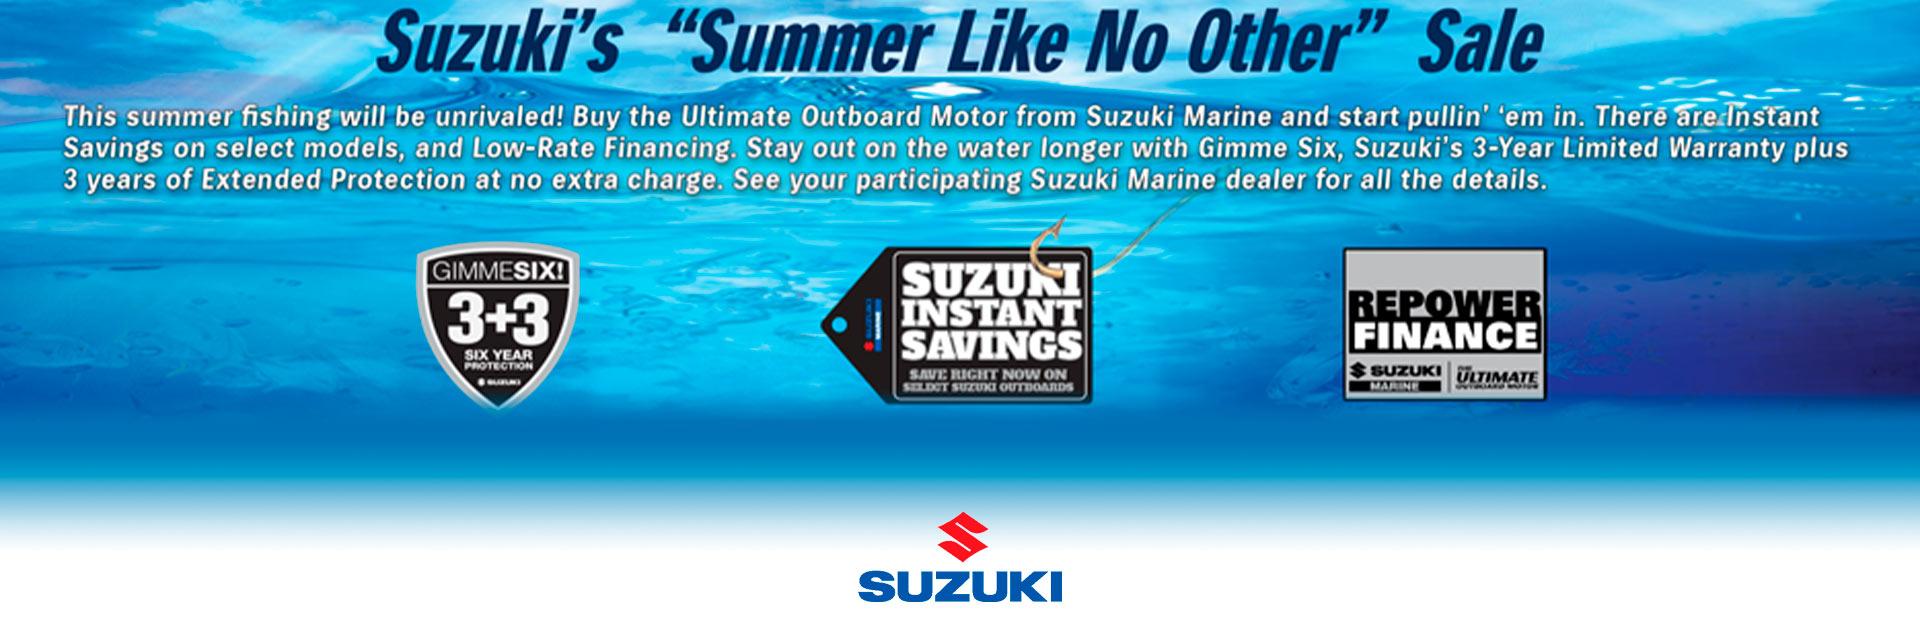 Suzuki - Summer Like No Other Summer Savings Top Notch Marine Florida